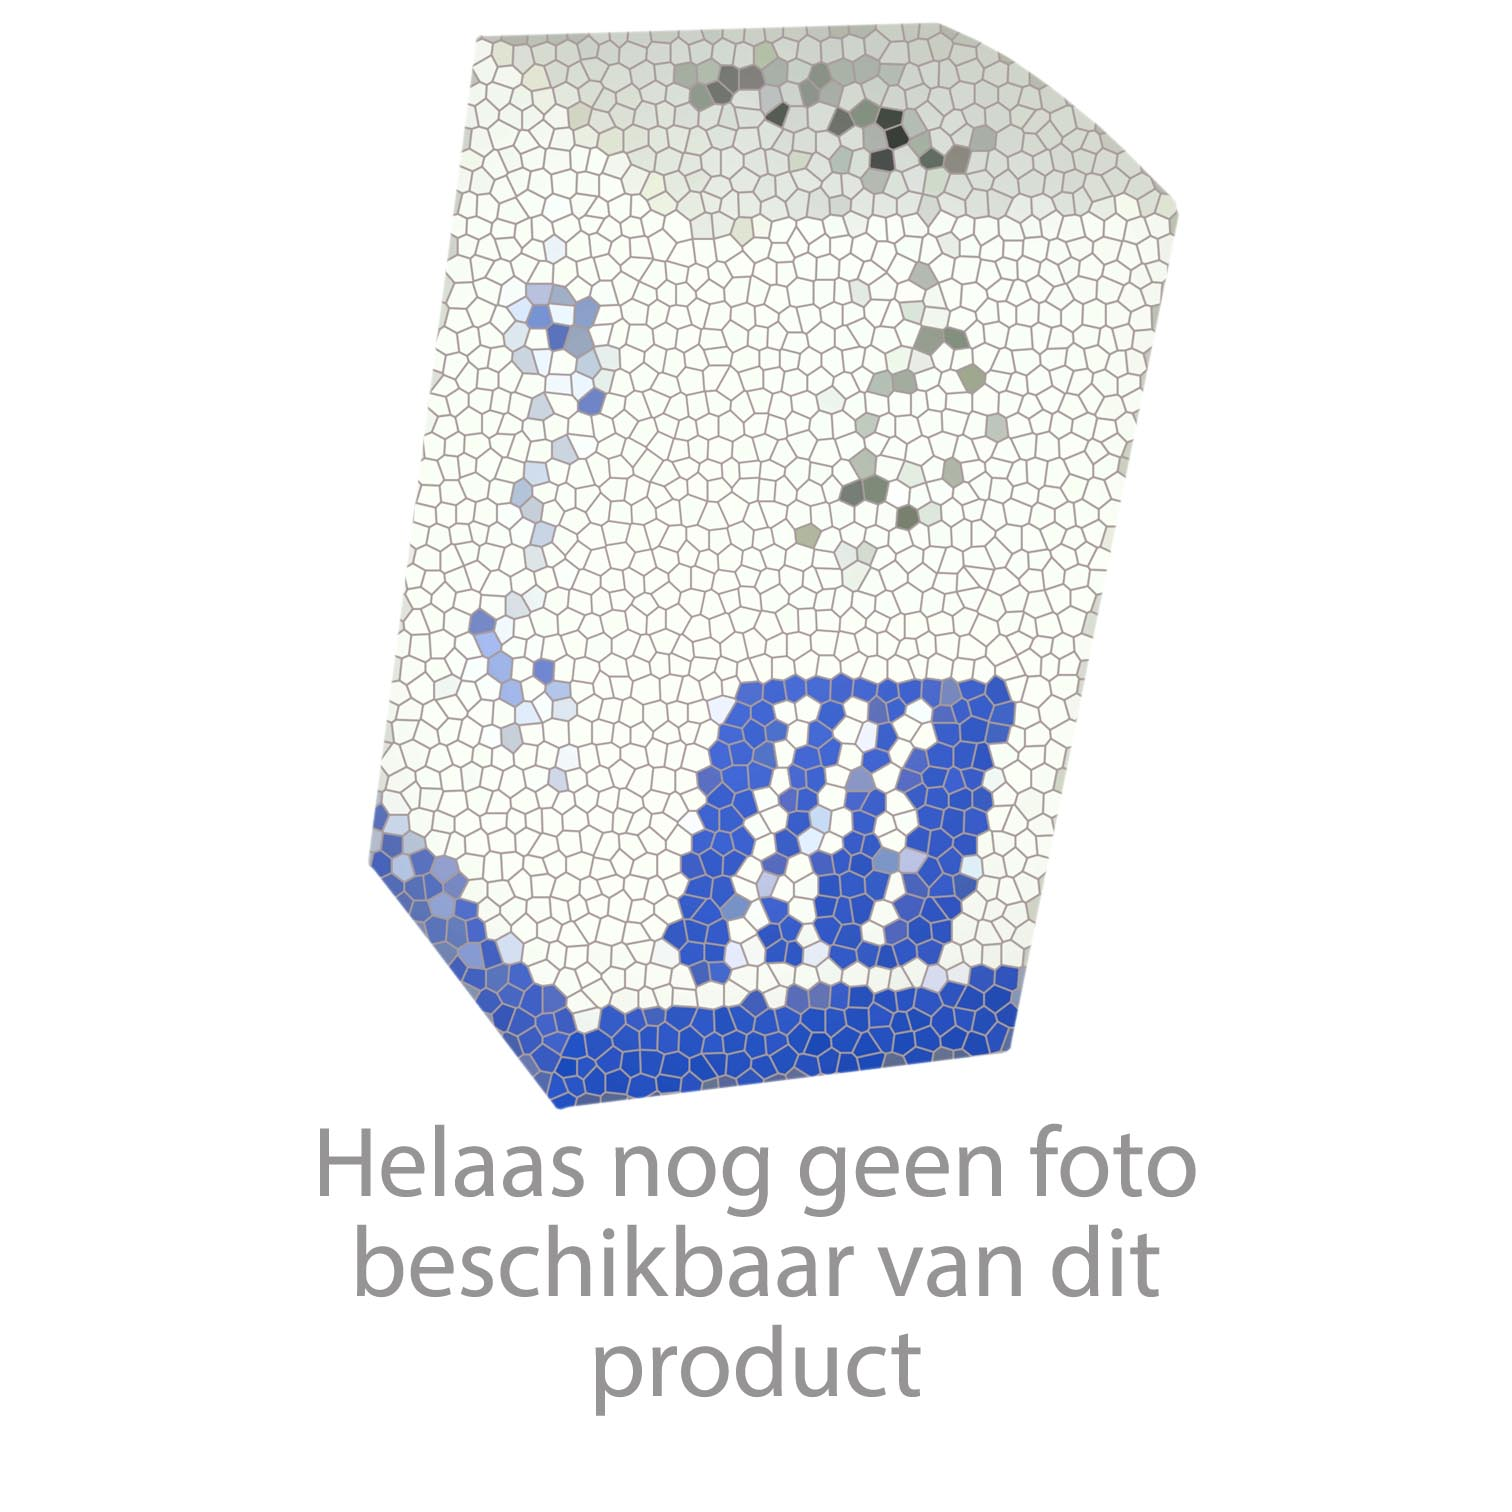 HansGrohe Keukenmengkranen Allegra Sportive / Allegra Talis'E productiejaar > 06/01 33820000 onderdelen